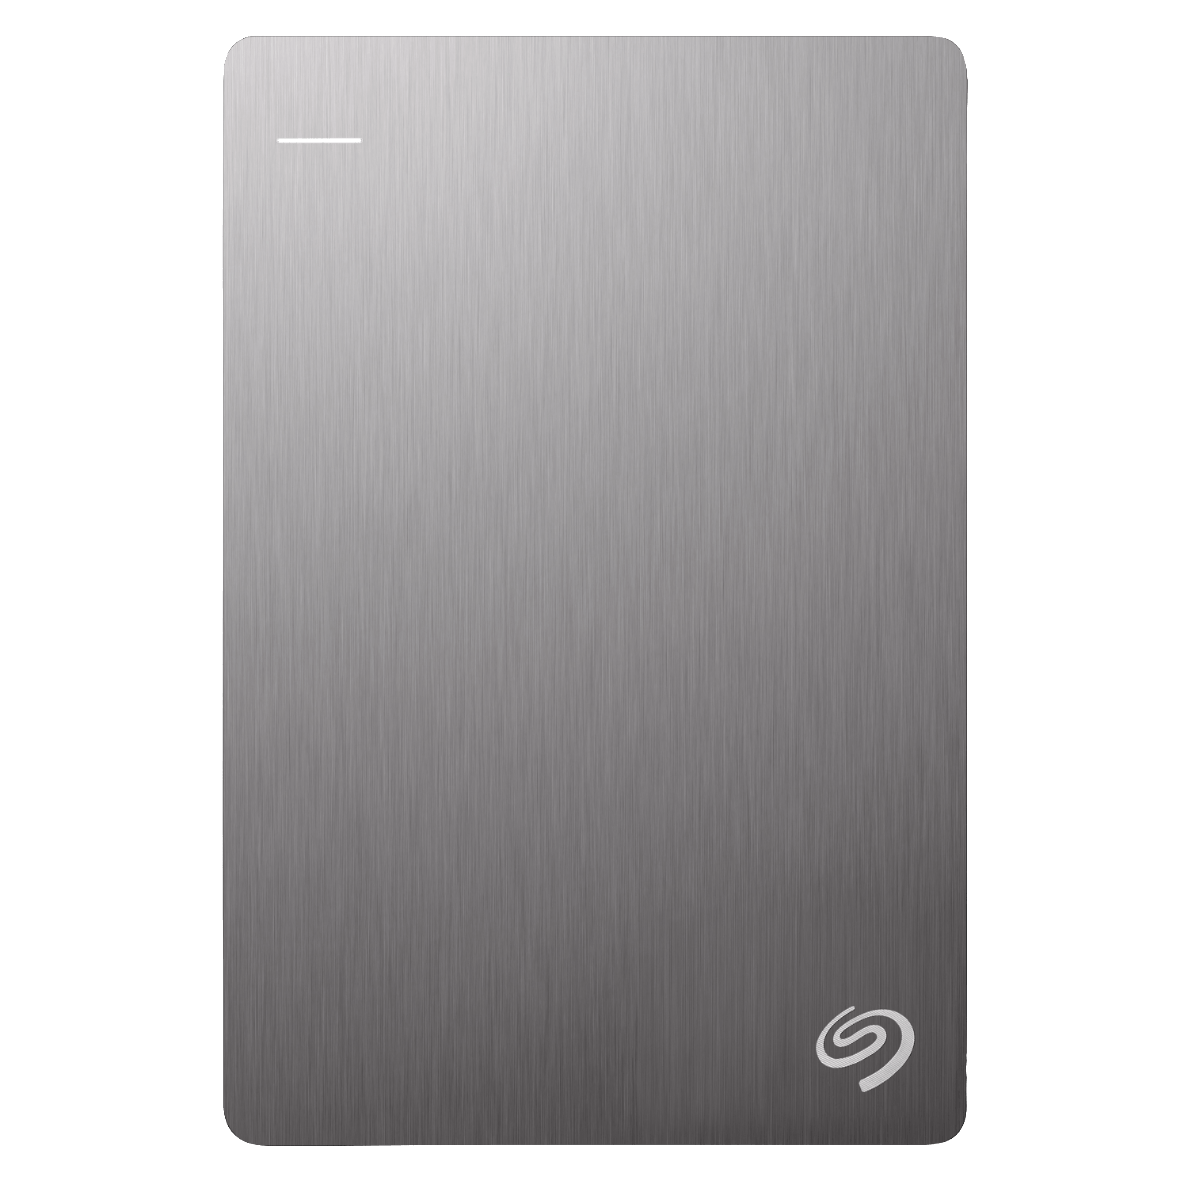 Seagate Backup Plus Slim 2 Tb Hdd 2 5 Zoll Extern 07636490051661 Backup Plus Slim Von Seagate Muhelose Autom Datensicherung Festplatte Externe Festplatte